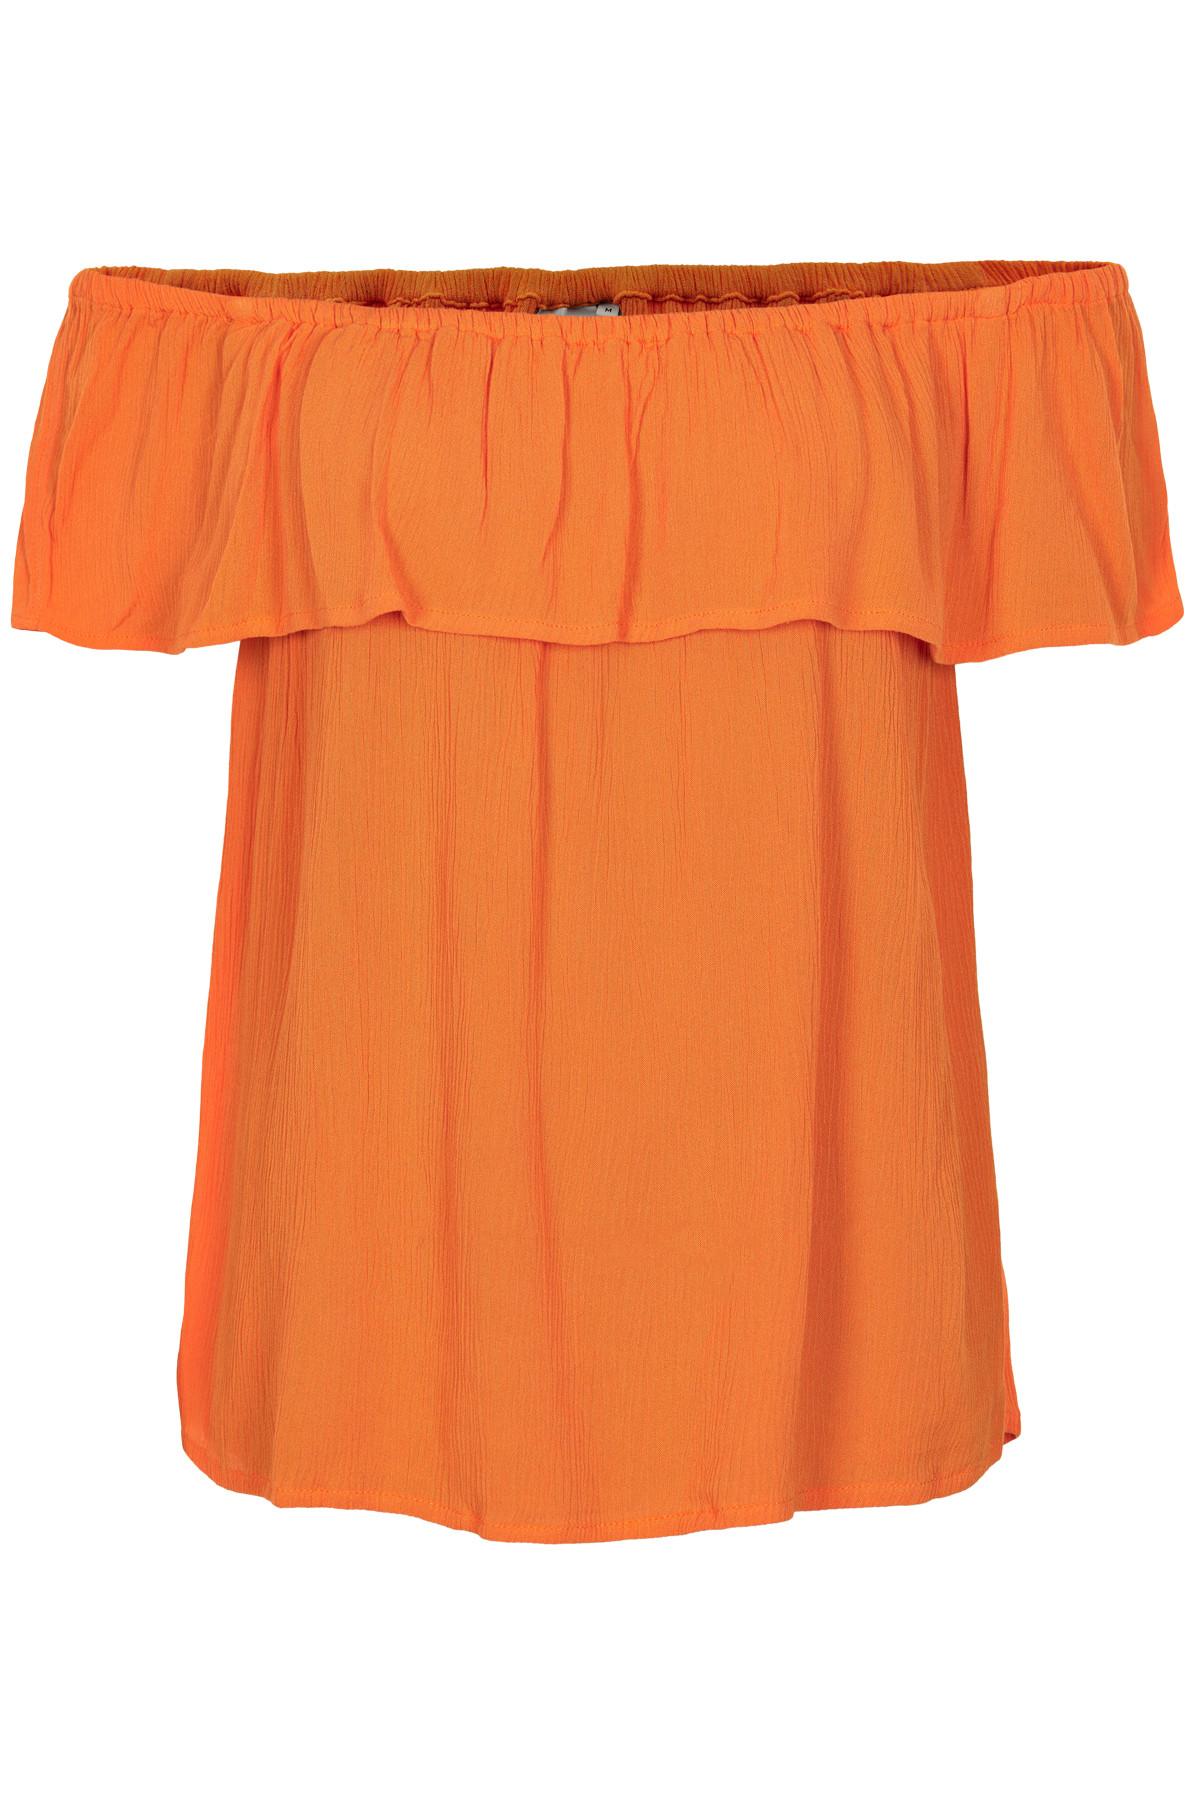 Image of   ICHI MARRAKECH TOP 20103351 17667 (Russet Orange 17667, XS)